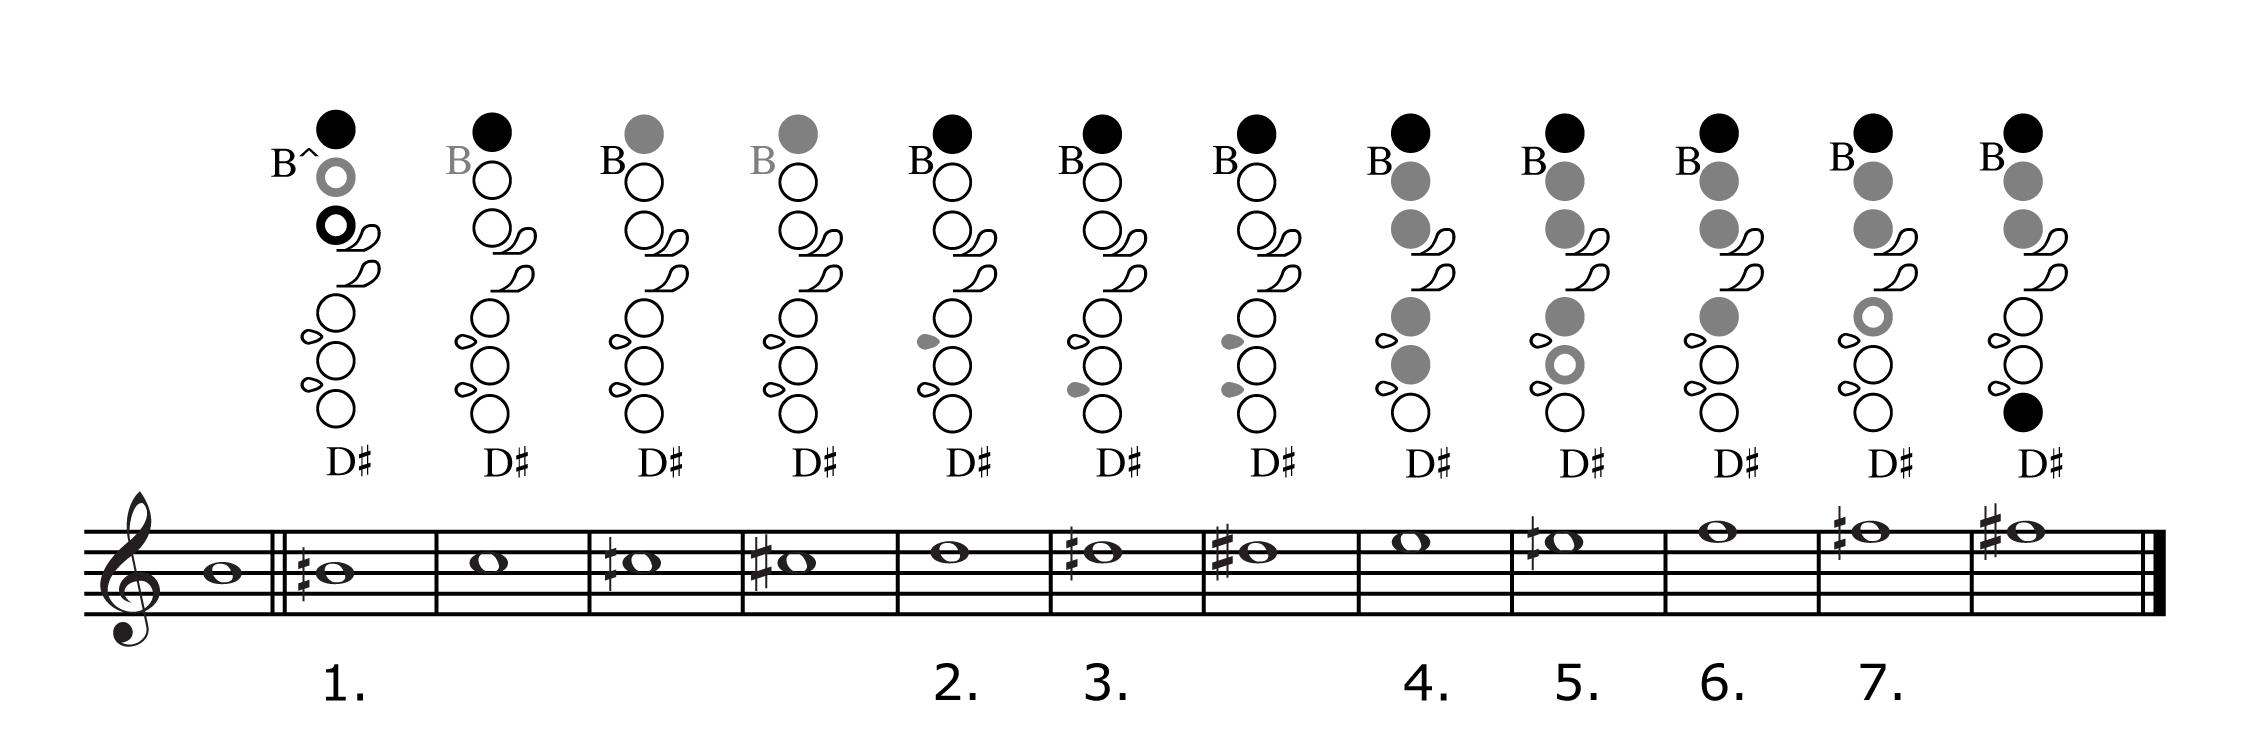 Bass flute Fingering Chart Flute Fingering Chart Amro Music Memphis